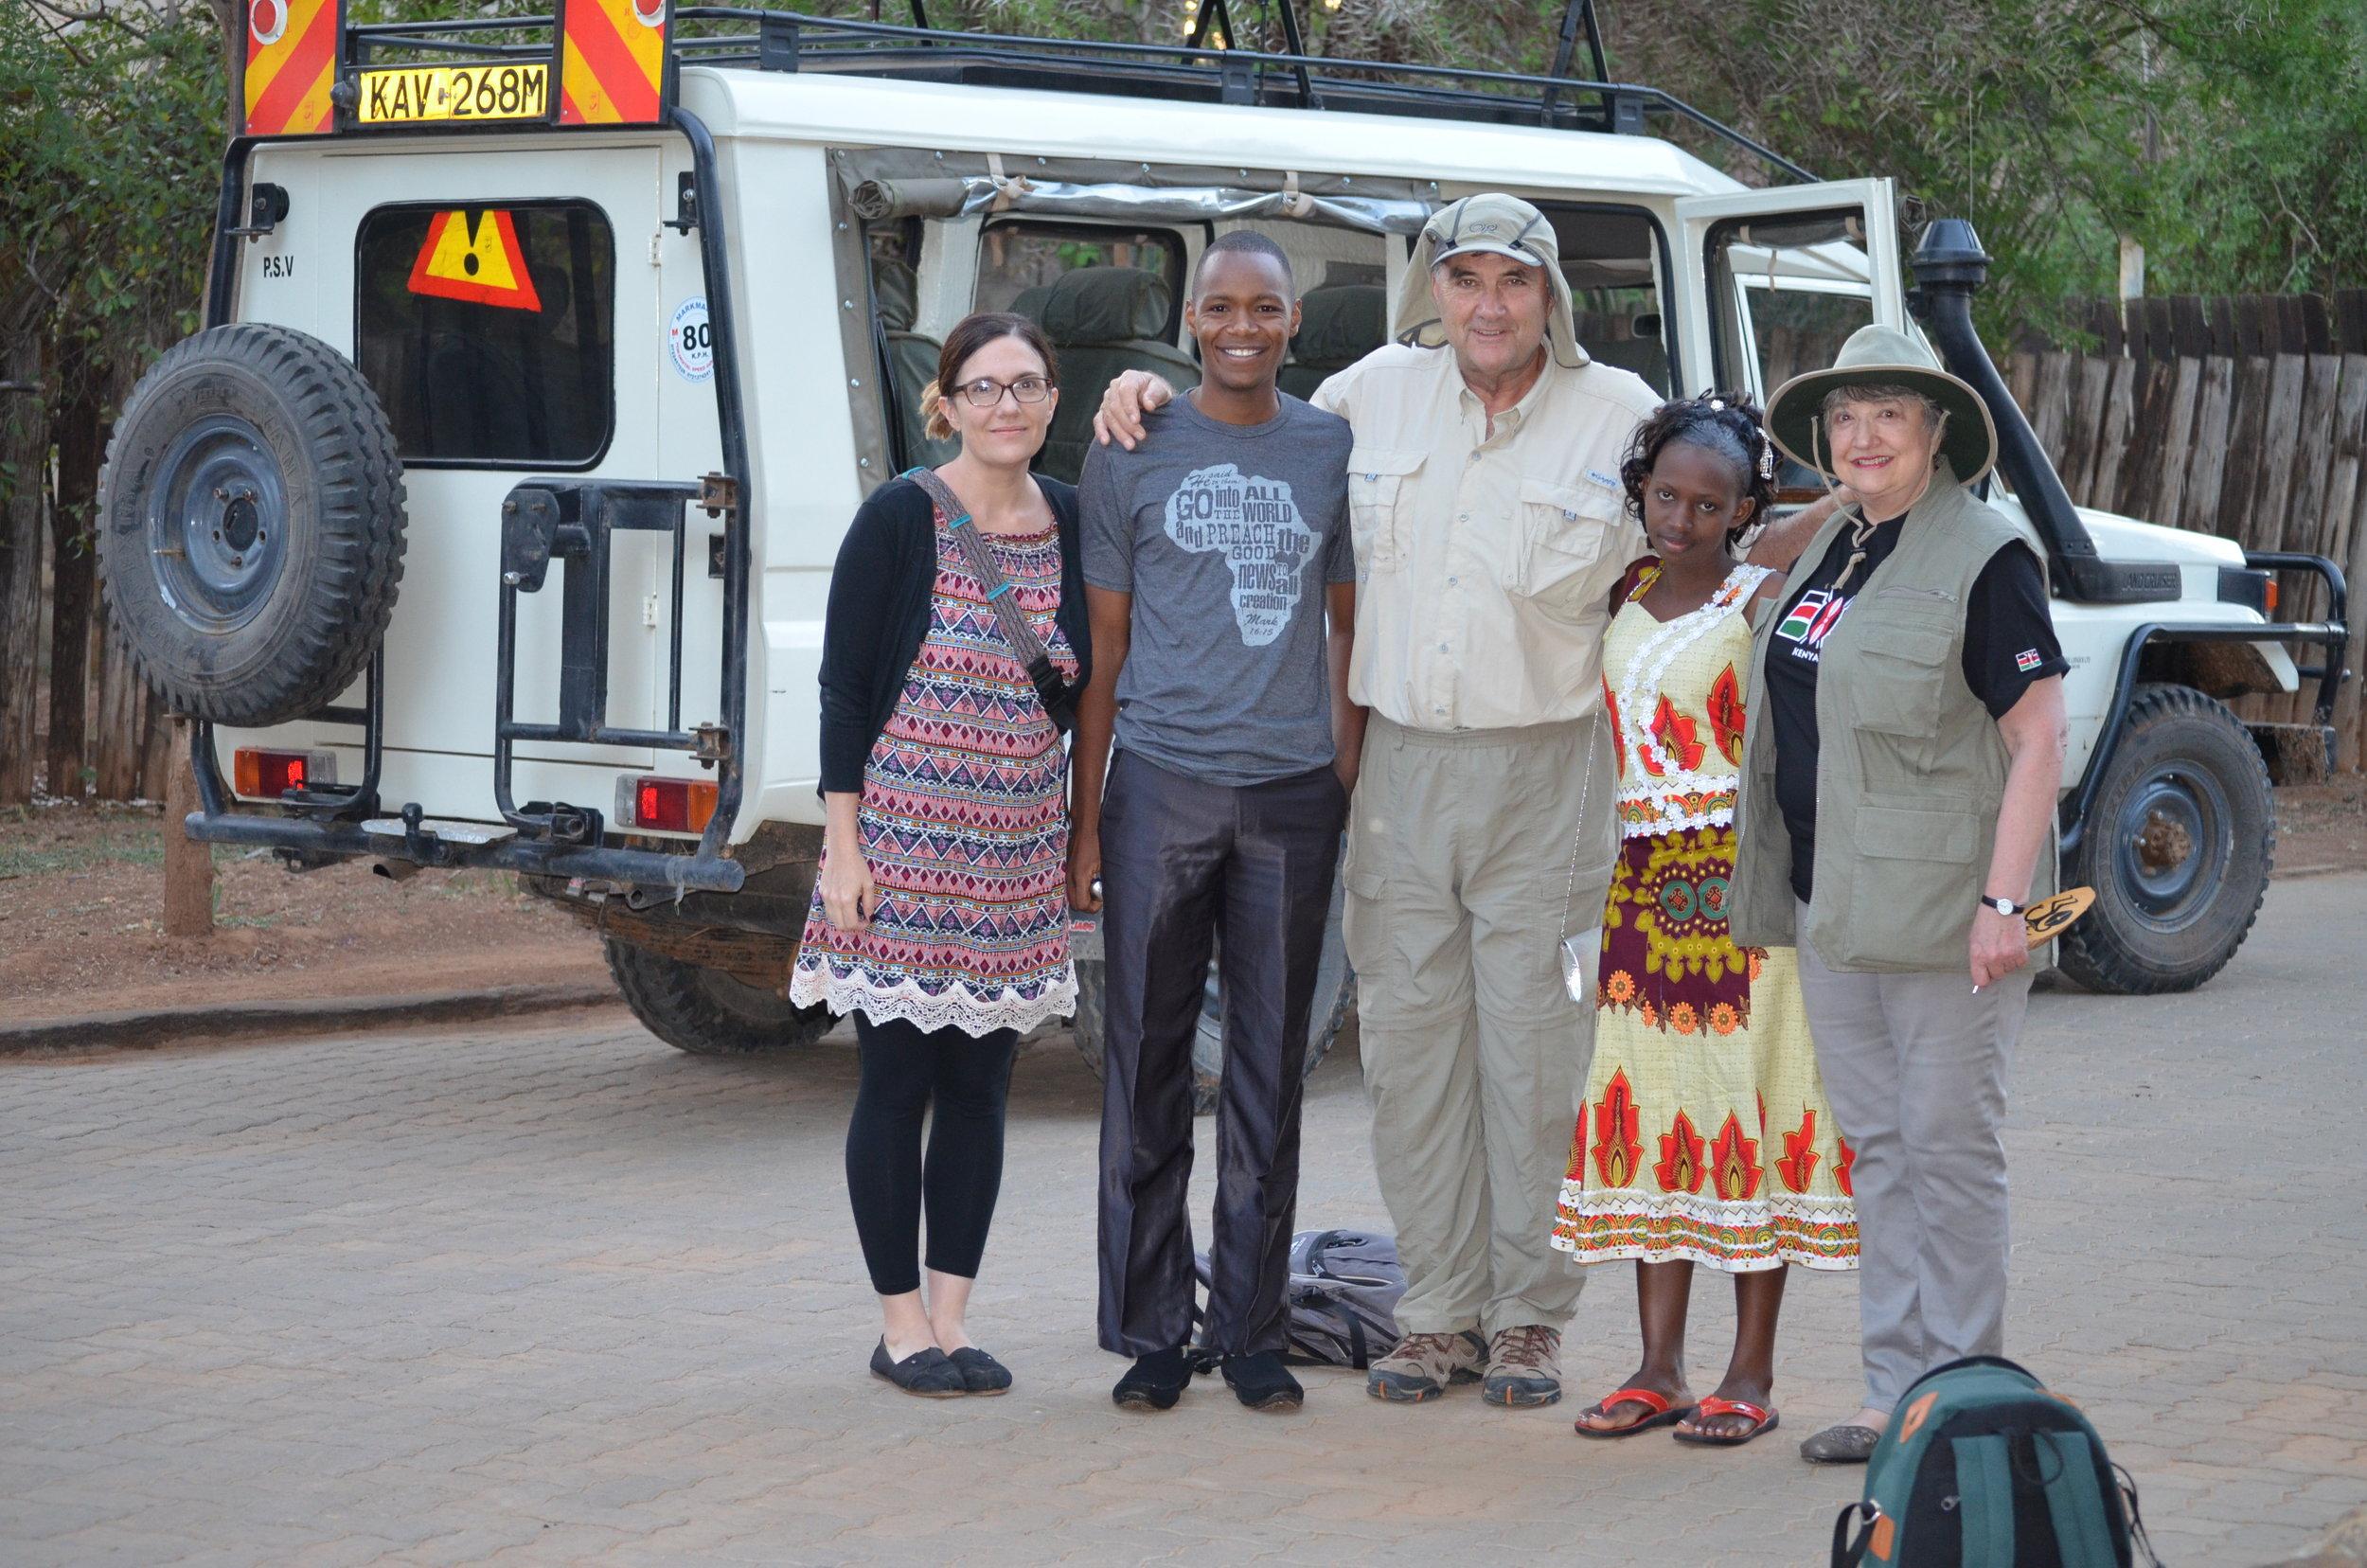 We had a great safari in Samburu (complete with mzungu safari gear).